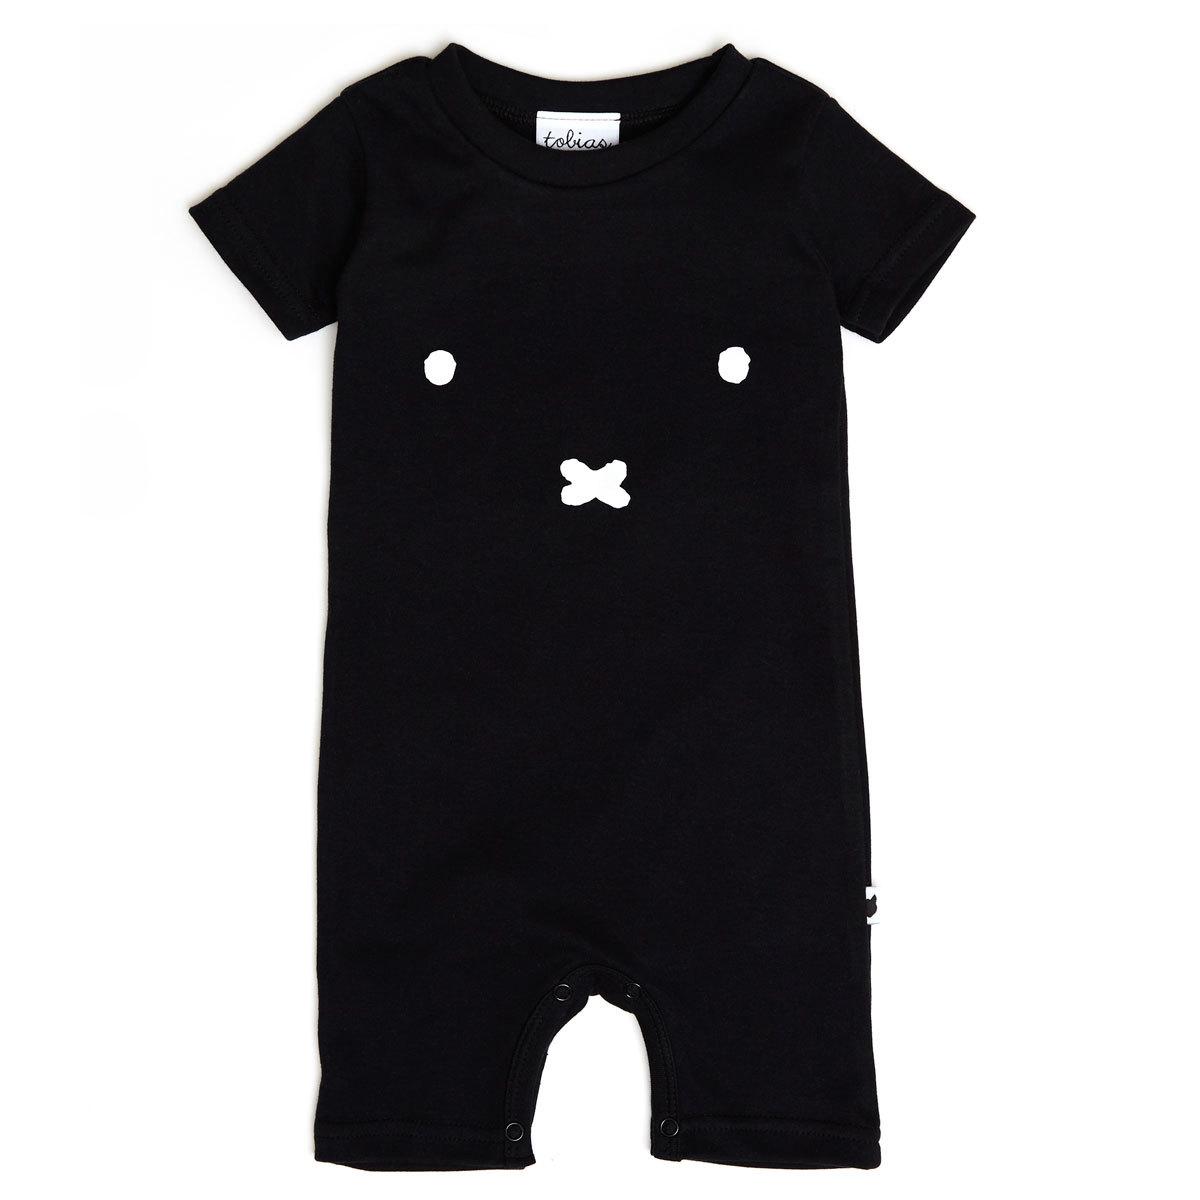 Body et Pyjama Body Short Miffy Face - 12/18 Mois Body Short Miffy Face - 12/18 Mois